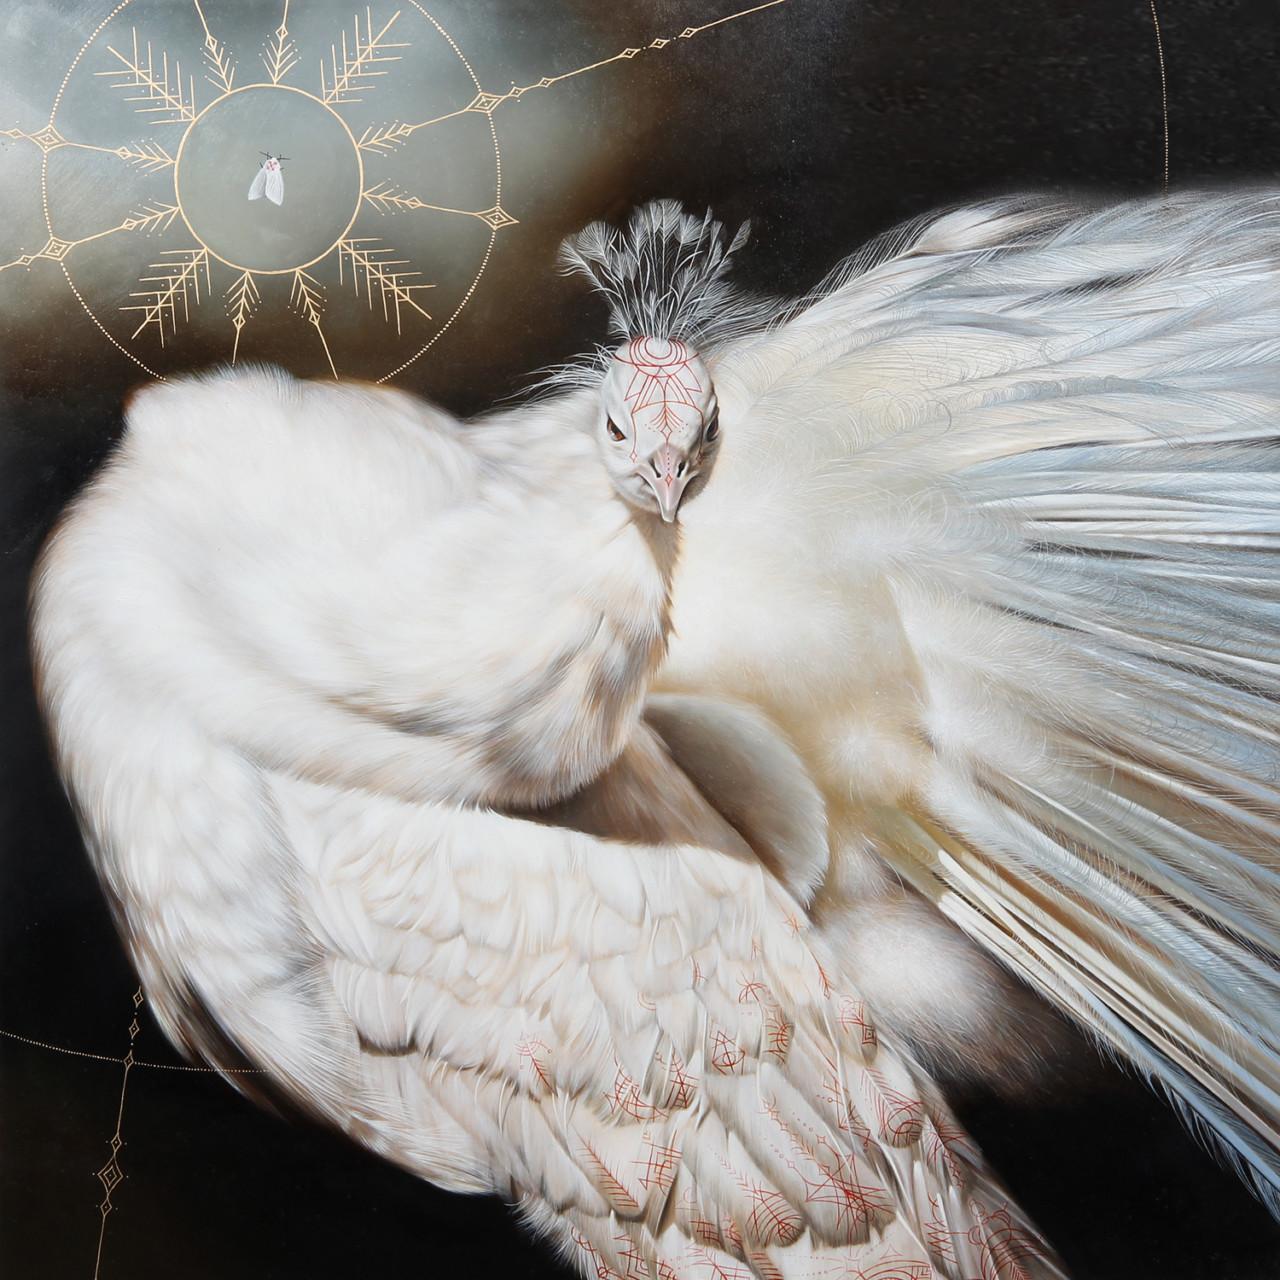 morway_peacock-640x640@2x